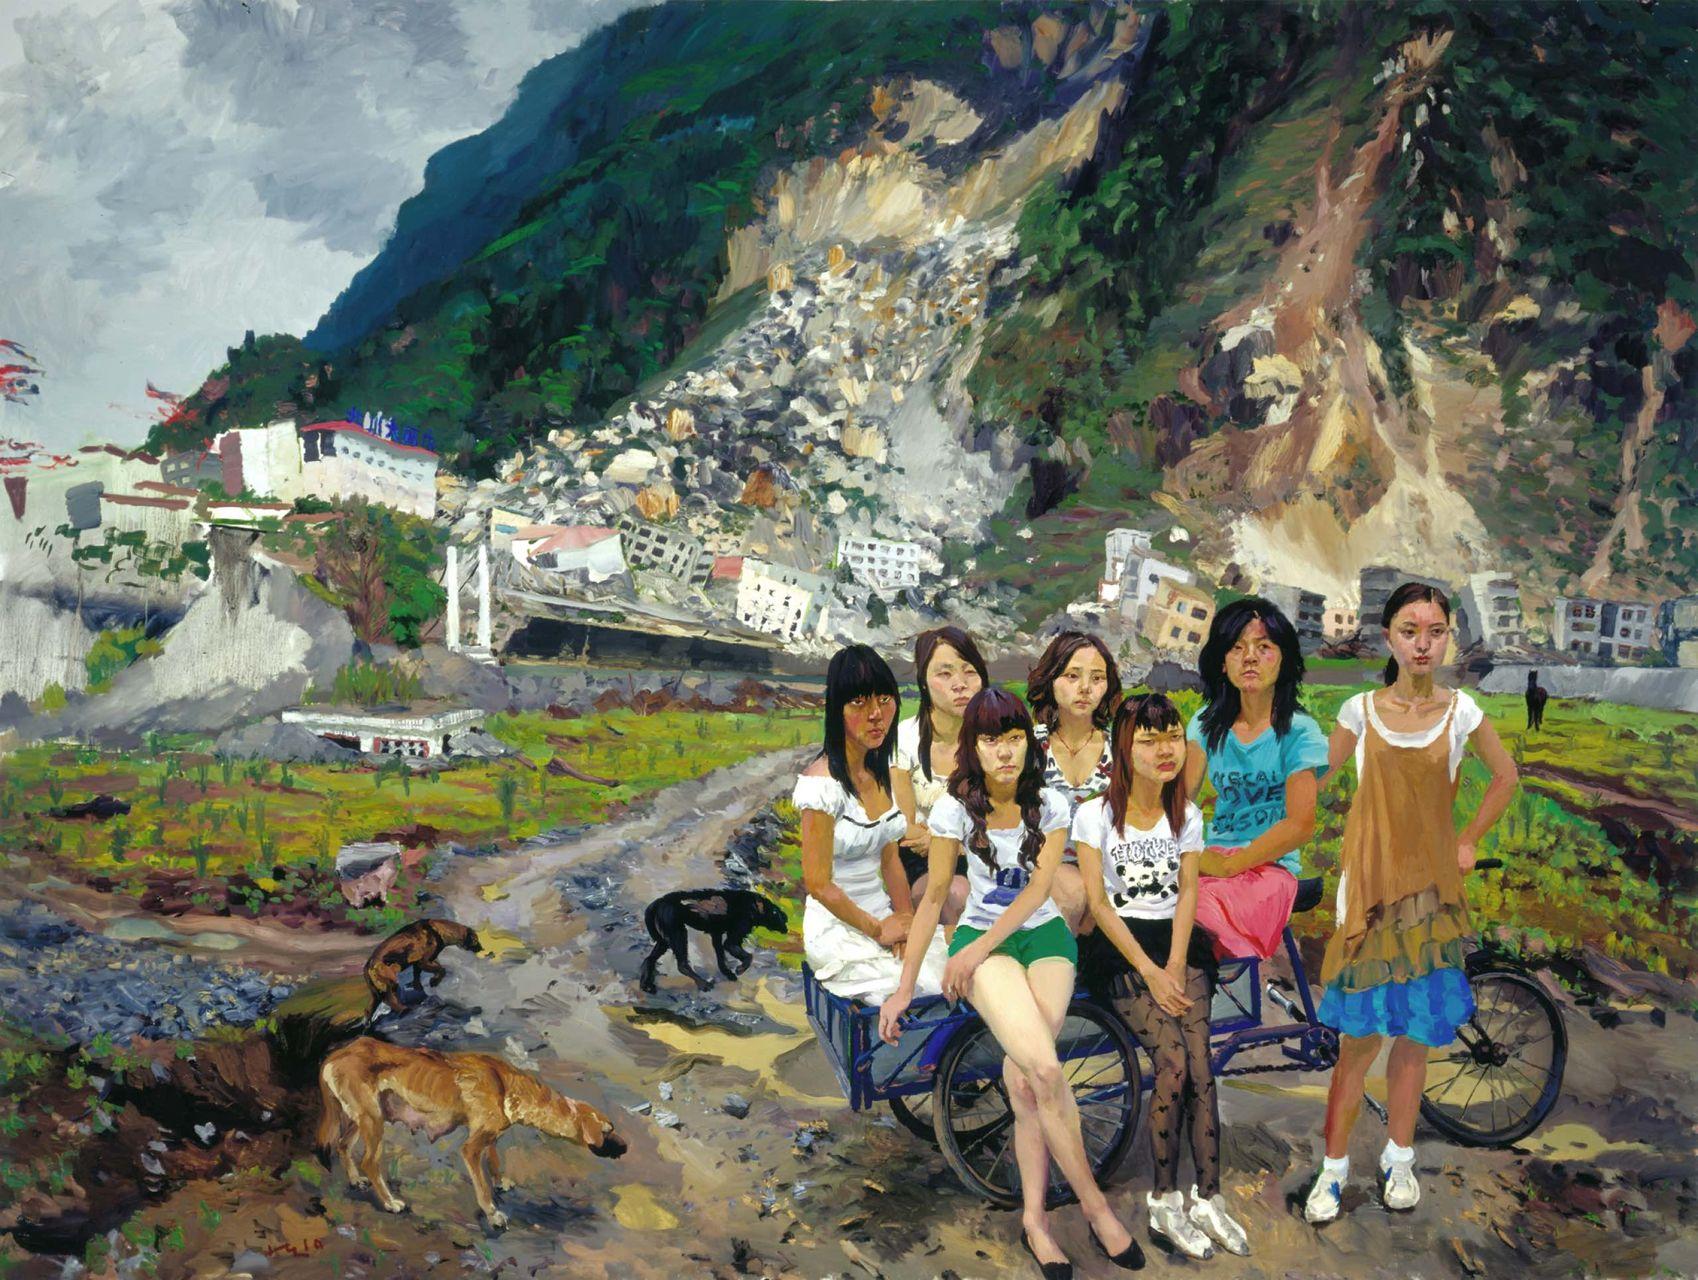 Liu Xiaodong: Painting as Shooting at Fondazione Giorgio Cini in Venice